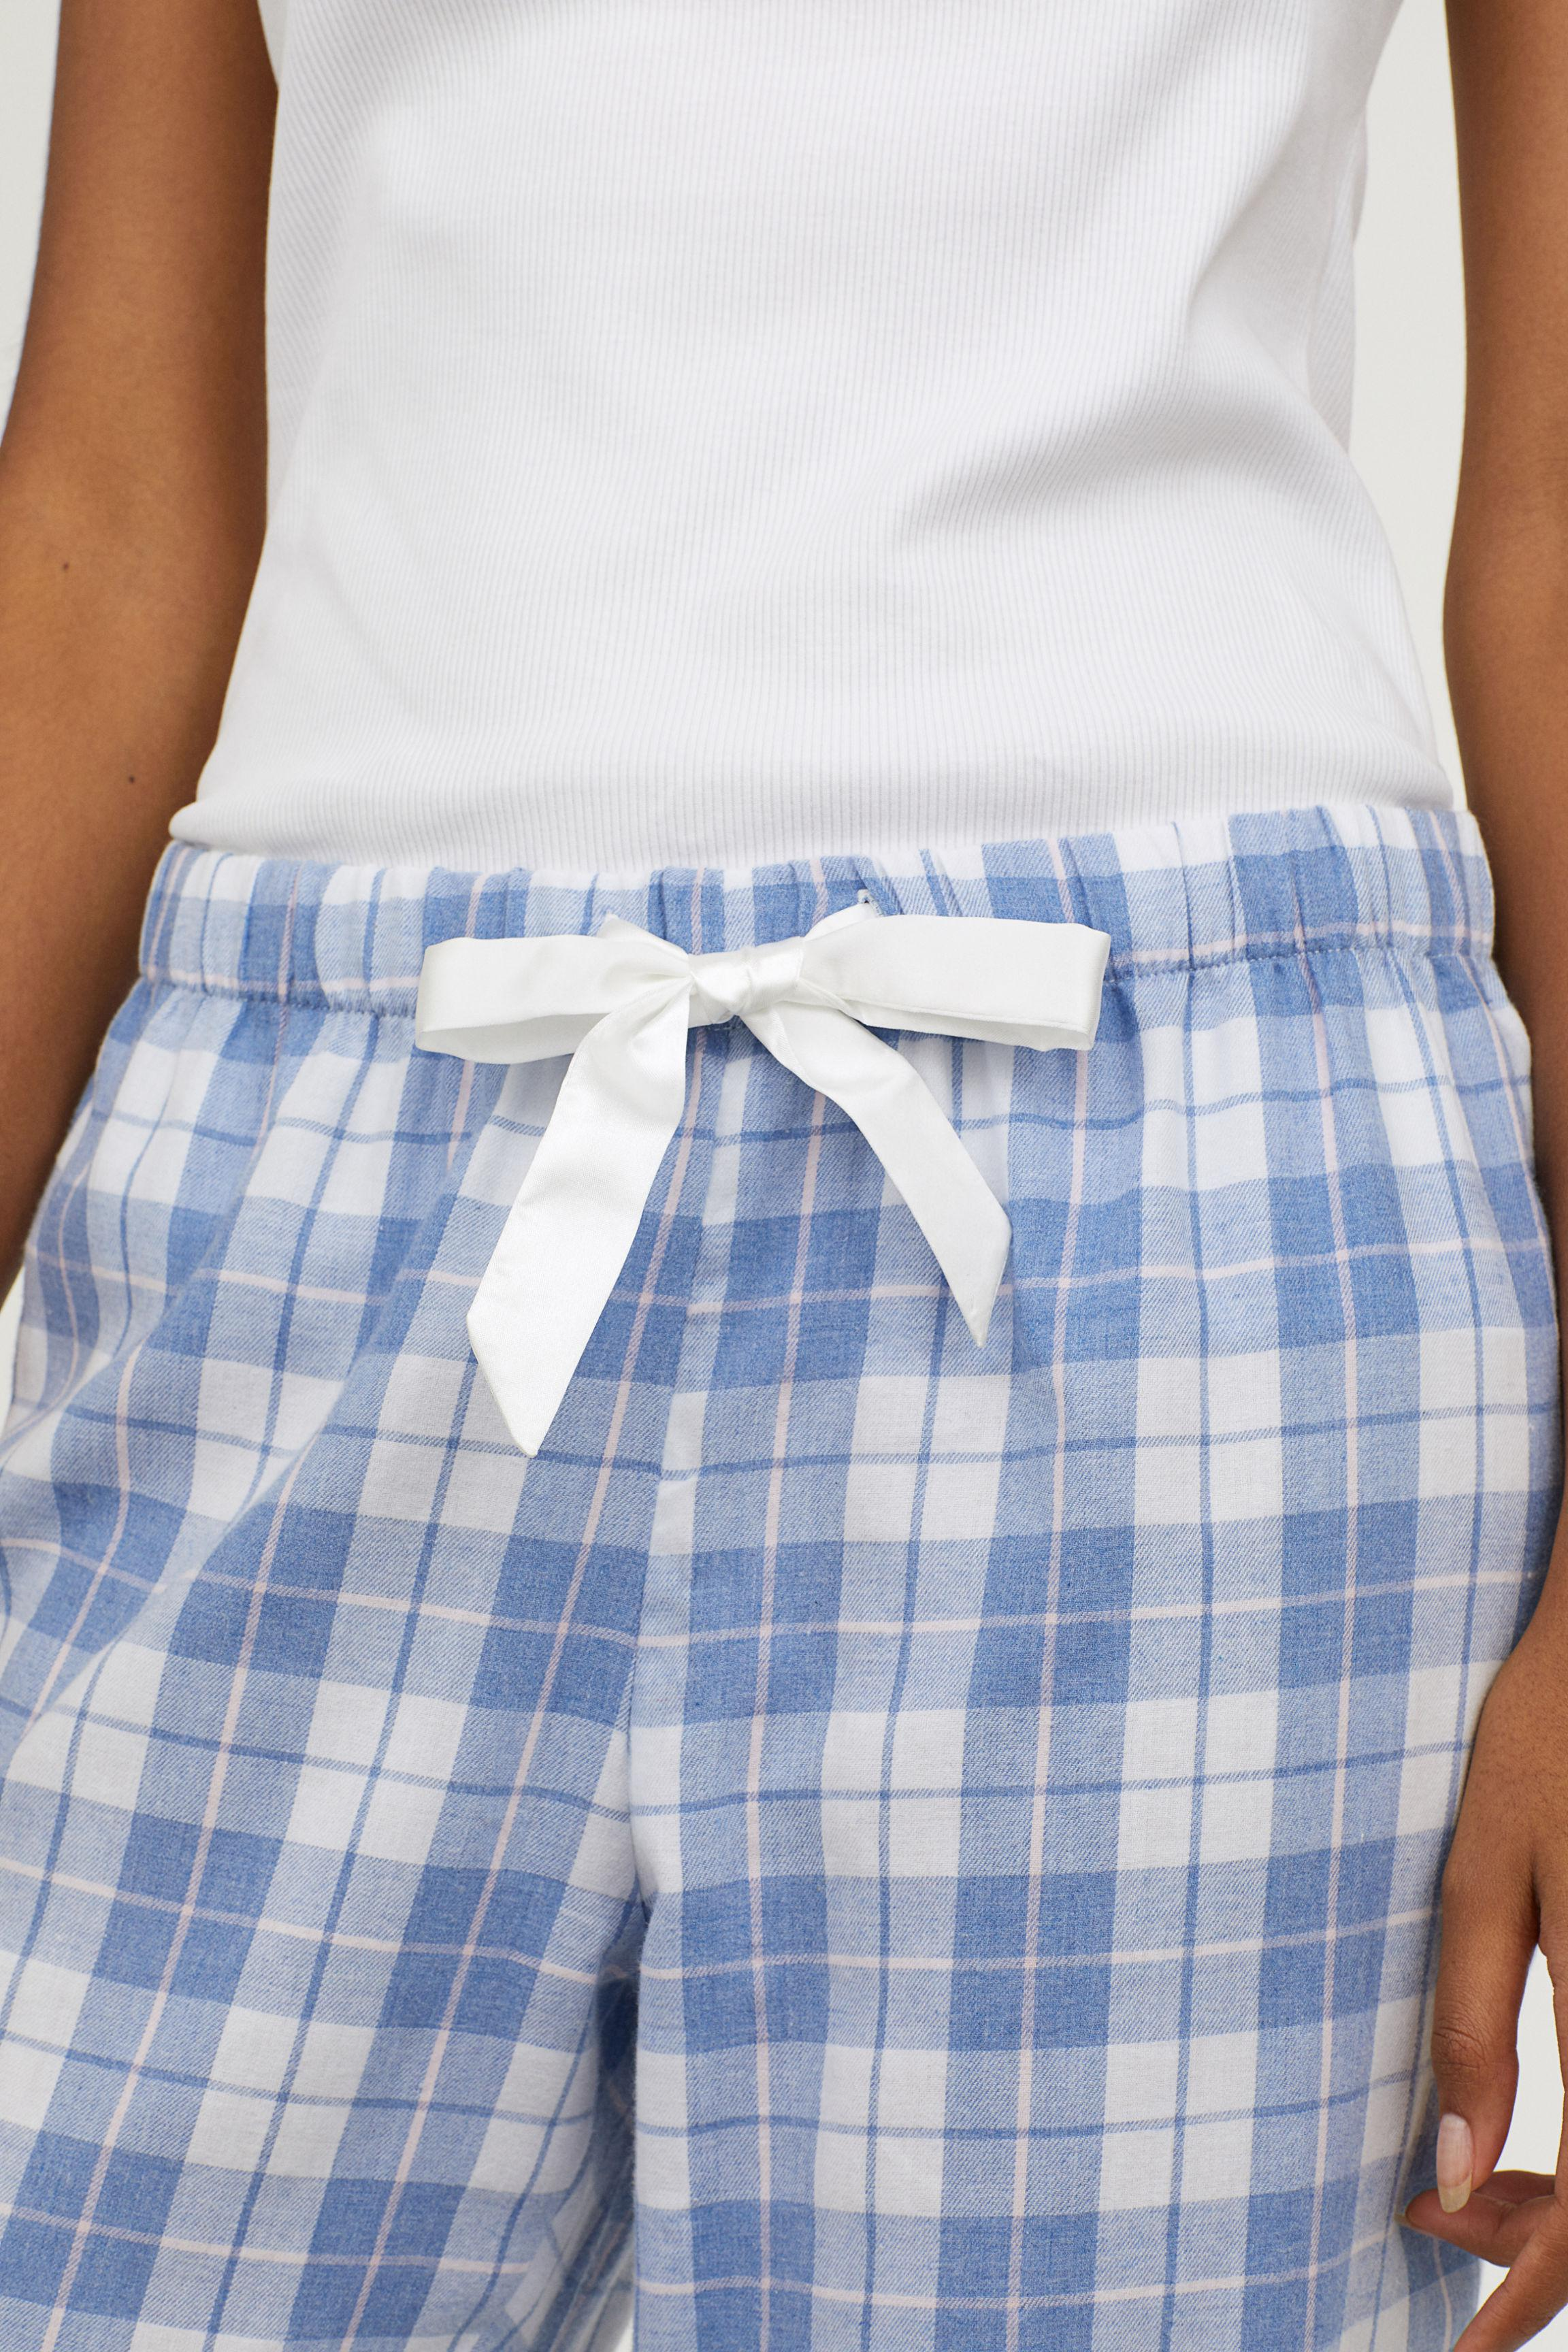 13af510960b57 Lyst - H M Flannel Pyjama Bottoms in Blue